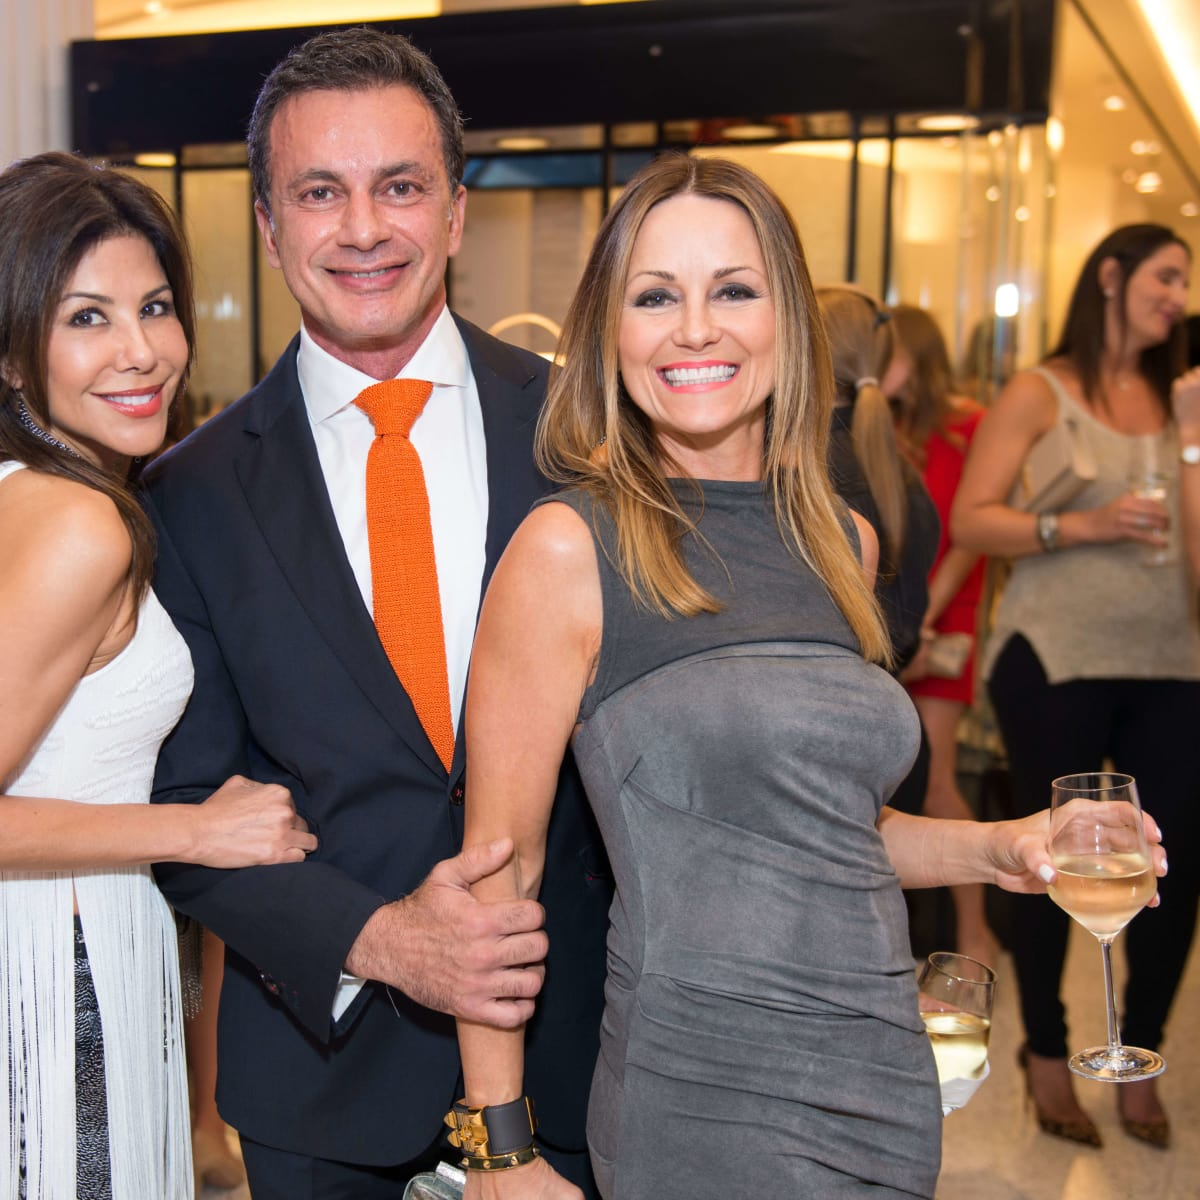 Fresh Faces of Fashion 8/16, Ericka Bagwell, Monsour Taghdisi, Lucinda Loya